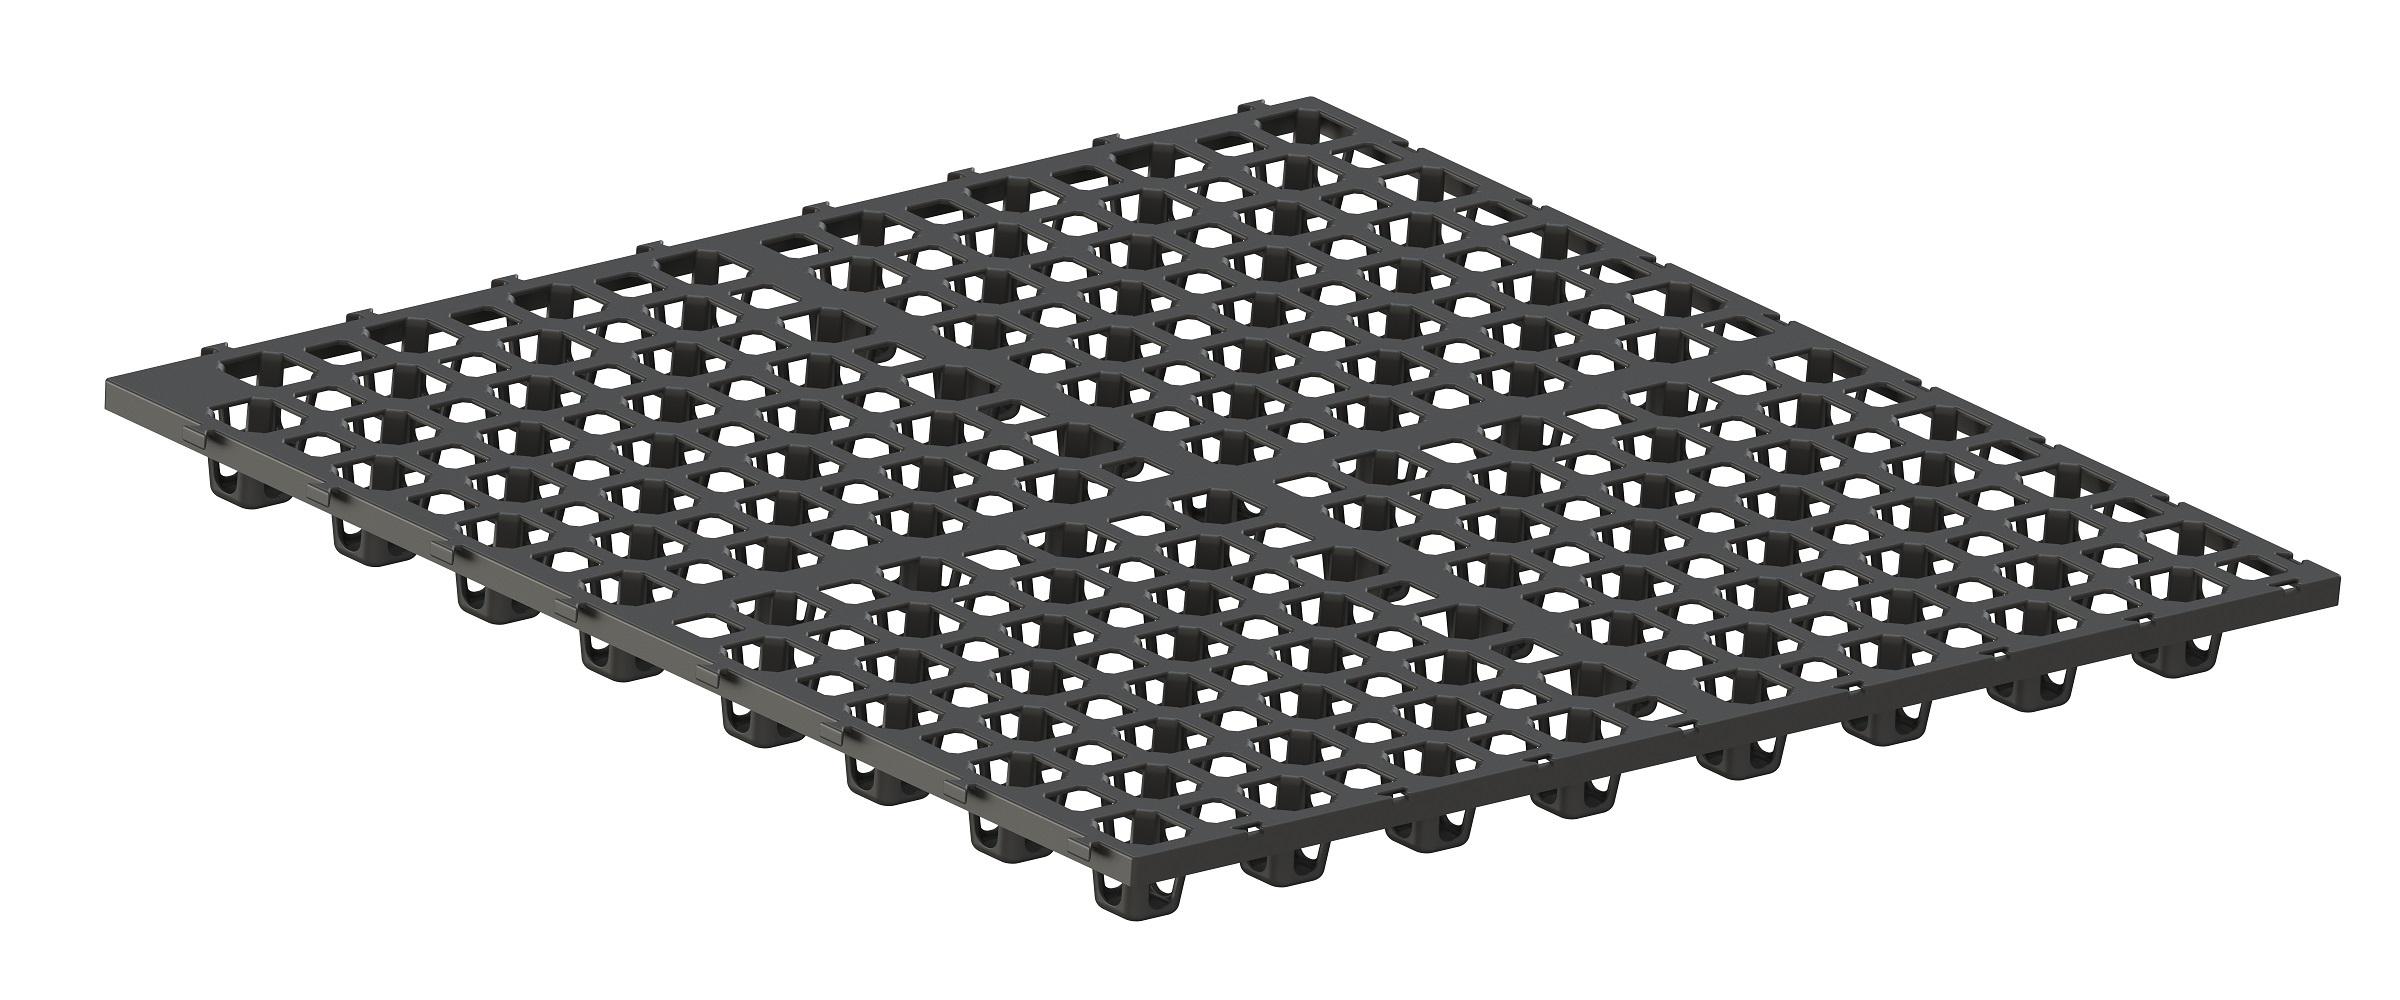 3D дренажа Производитель;3D дренажа;مصنع الصرف 3D;تصريف 3D ثلاثي الأبعاد;Dîwarê 3D;3D დრენაჟი; 3D drenaj;3D drenaj üreticisi زهکش سه بعدی گلسین